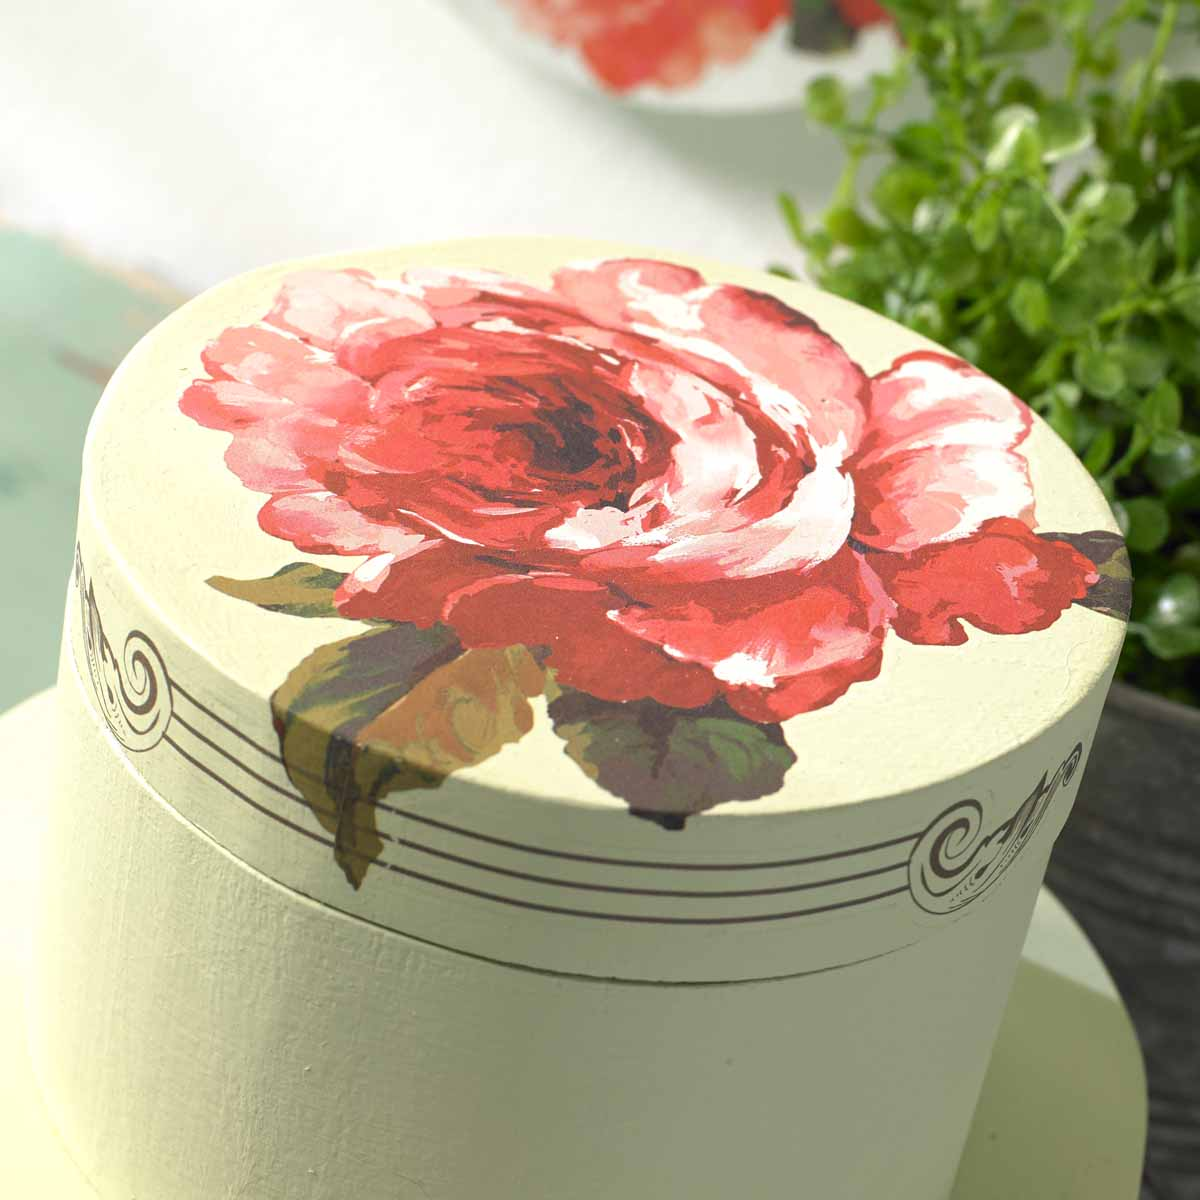 FolkArt ® Rub-On Décor Transfer - Floral, 3 pc. - 36107